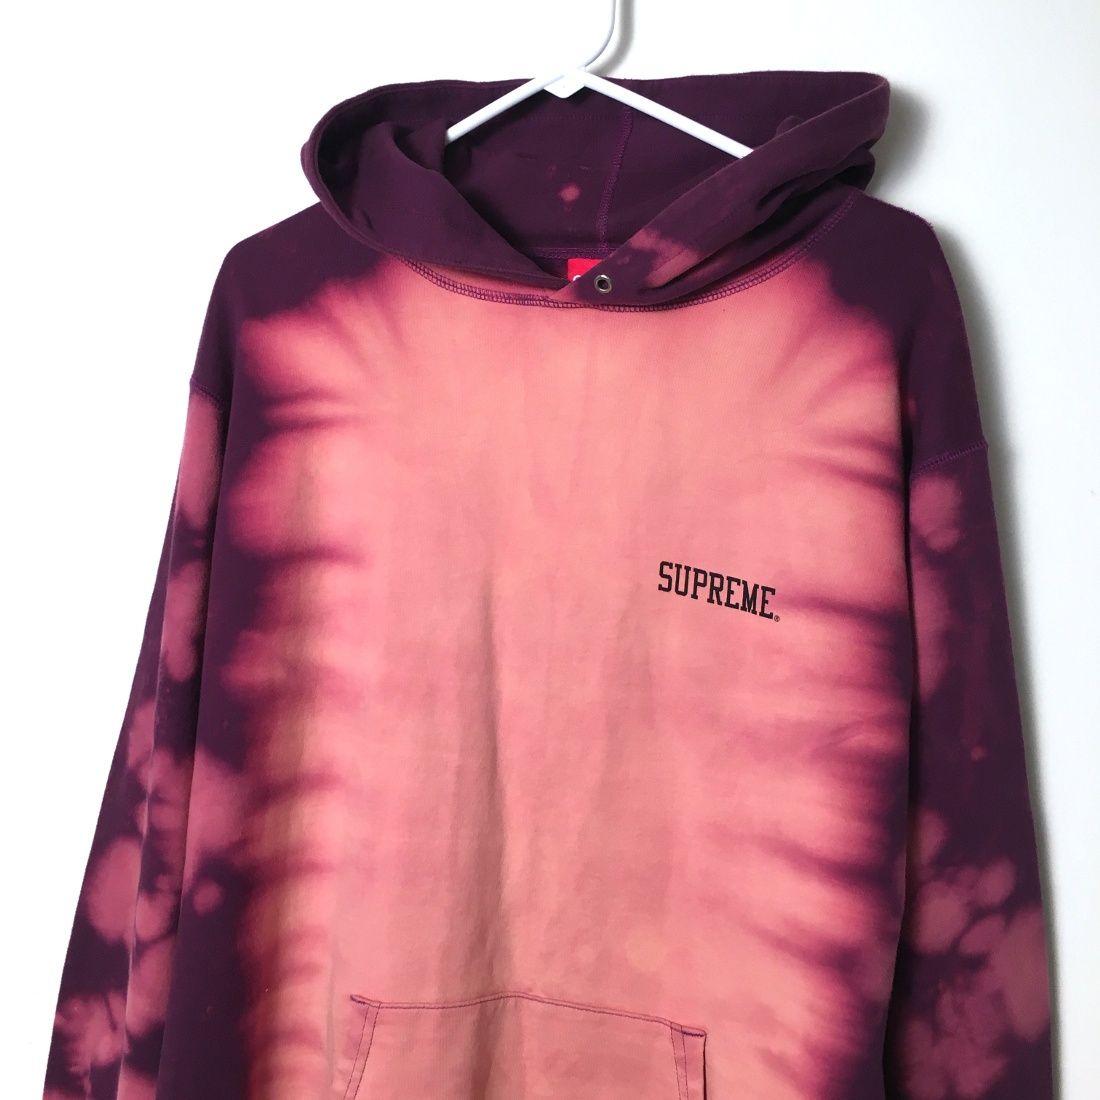 Supreme Siouxsie Tie Dye Hoodie Size Xl 325 Tie Dye Hoodie Hoodies Fashion [ 1100 x 1100 Pixel ]